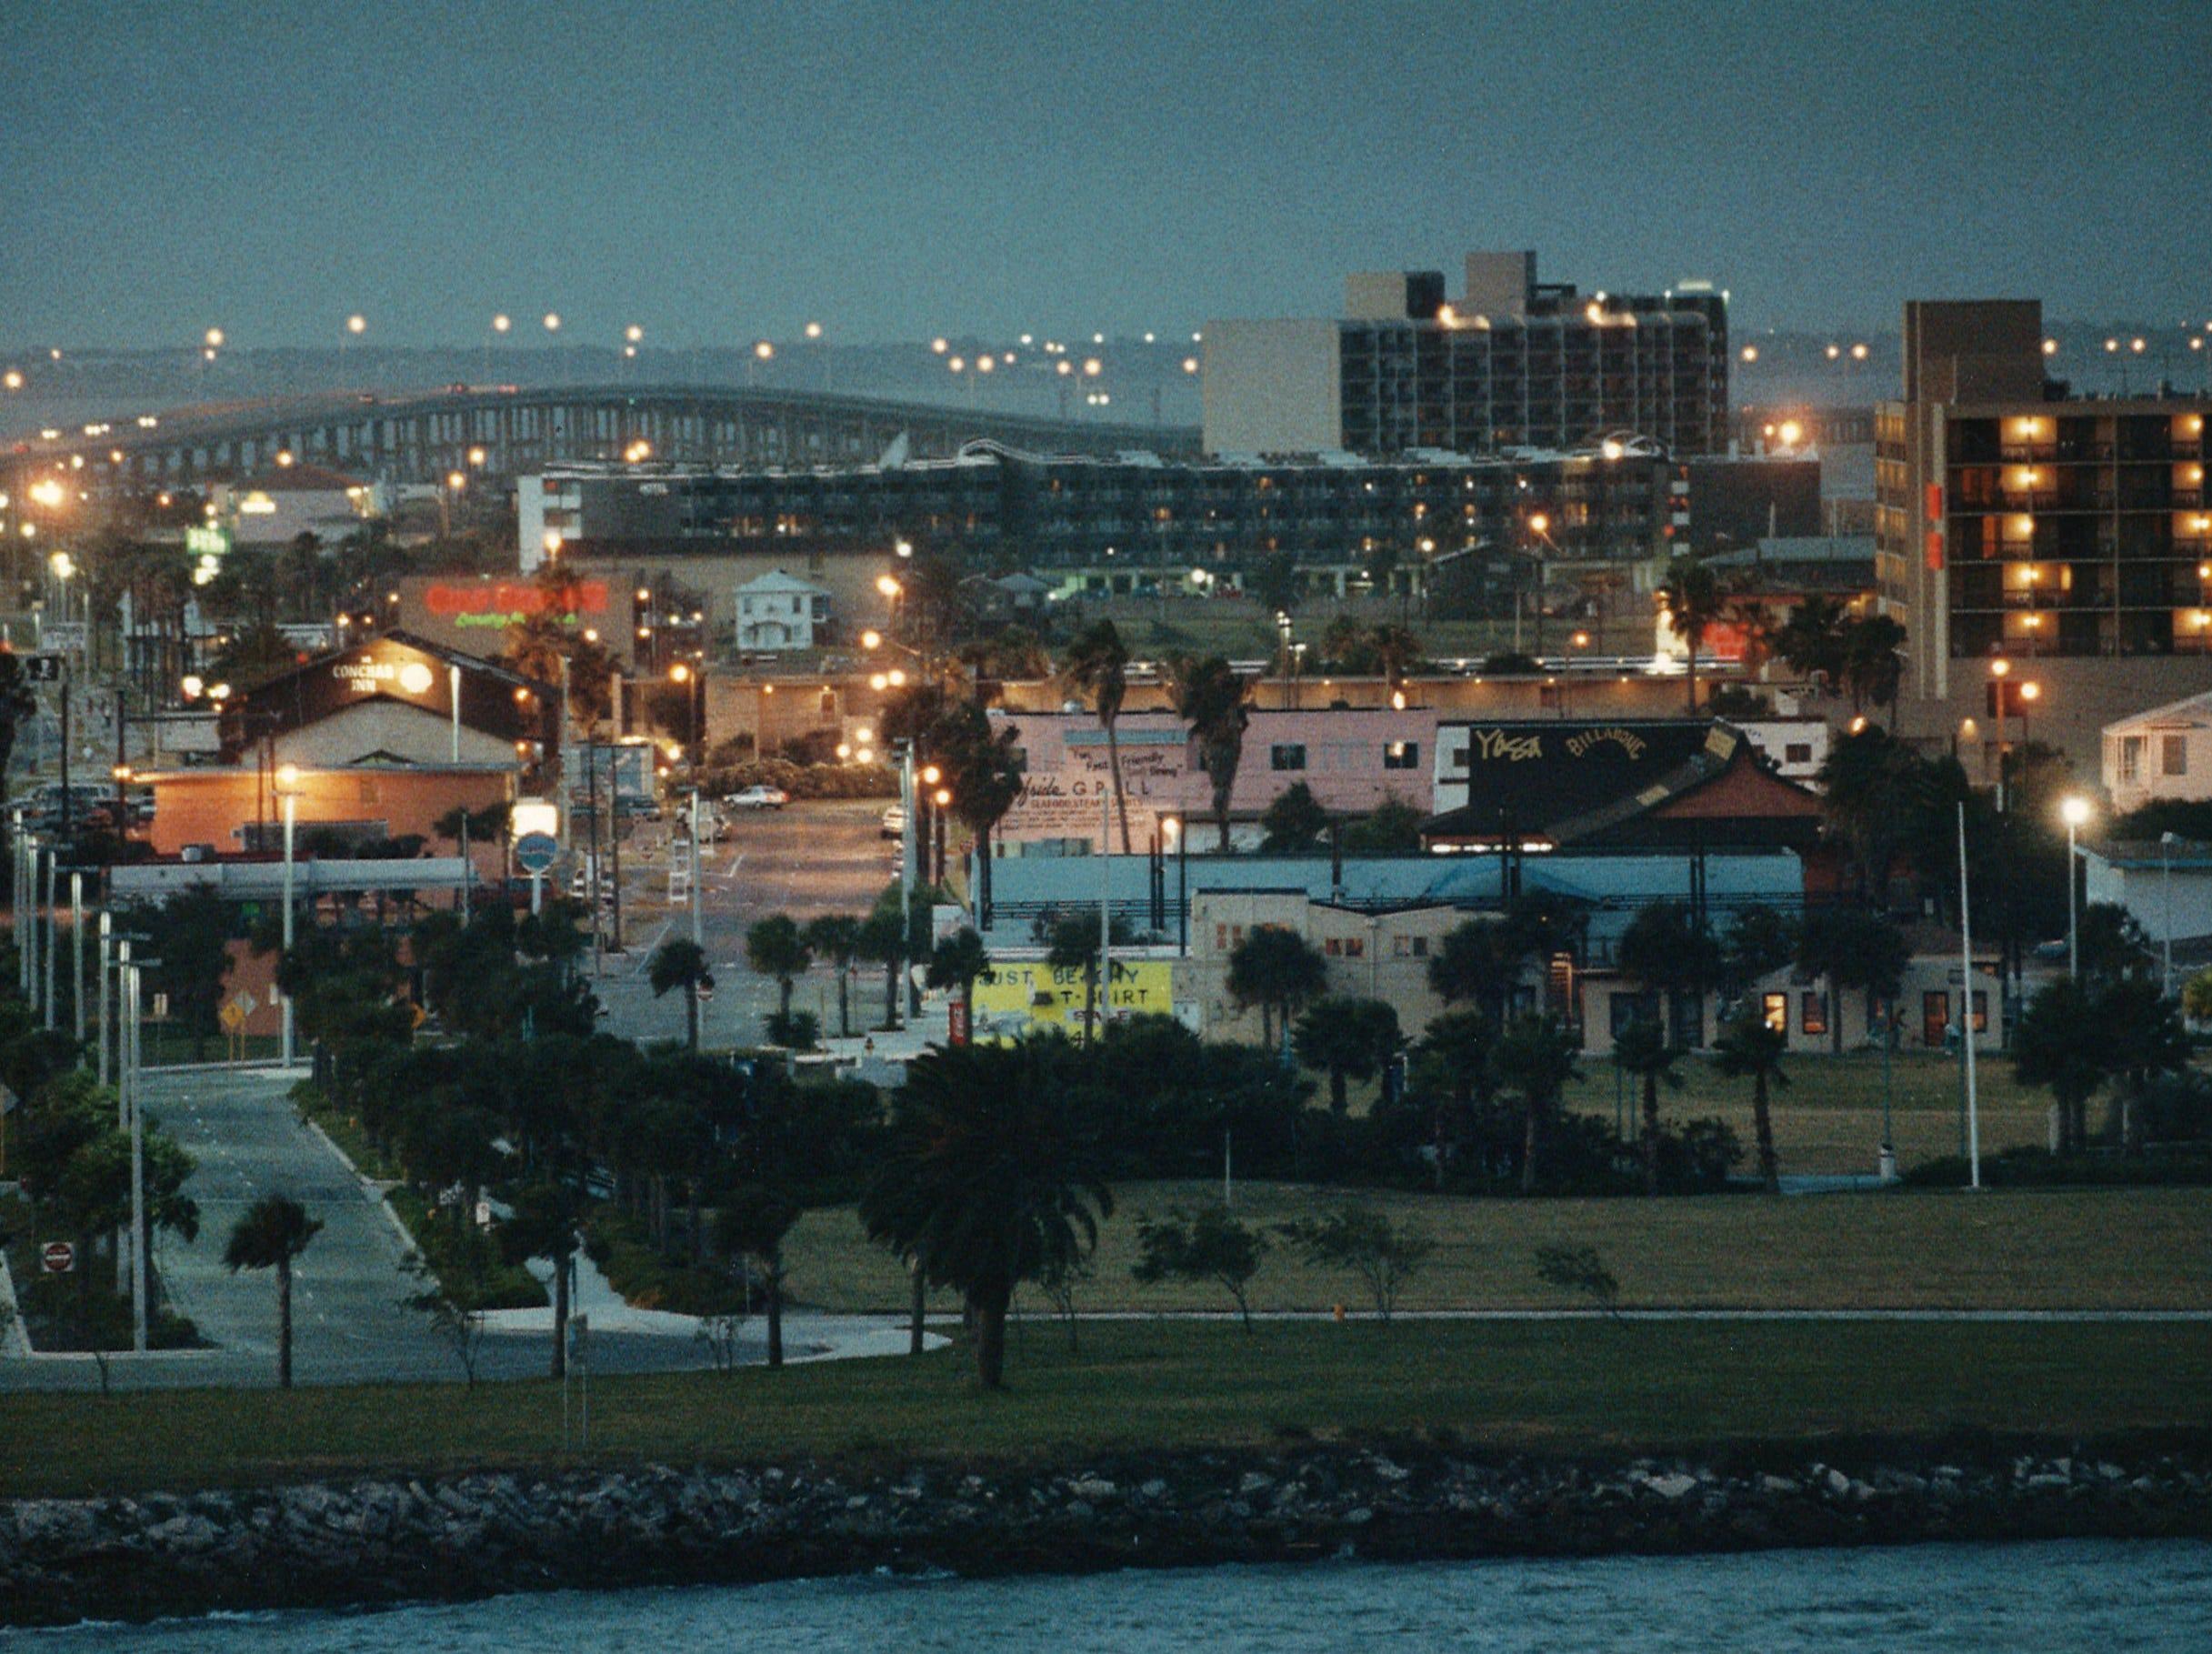 Corpus Christi's North Beach on July 14, 1993.